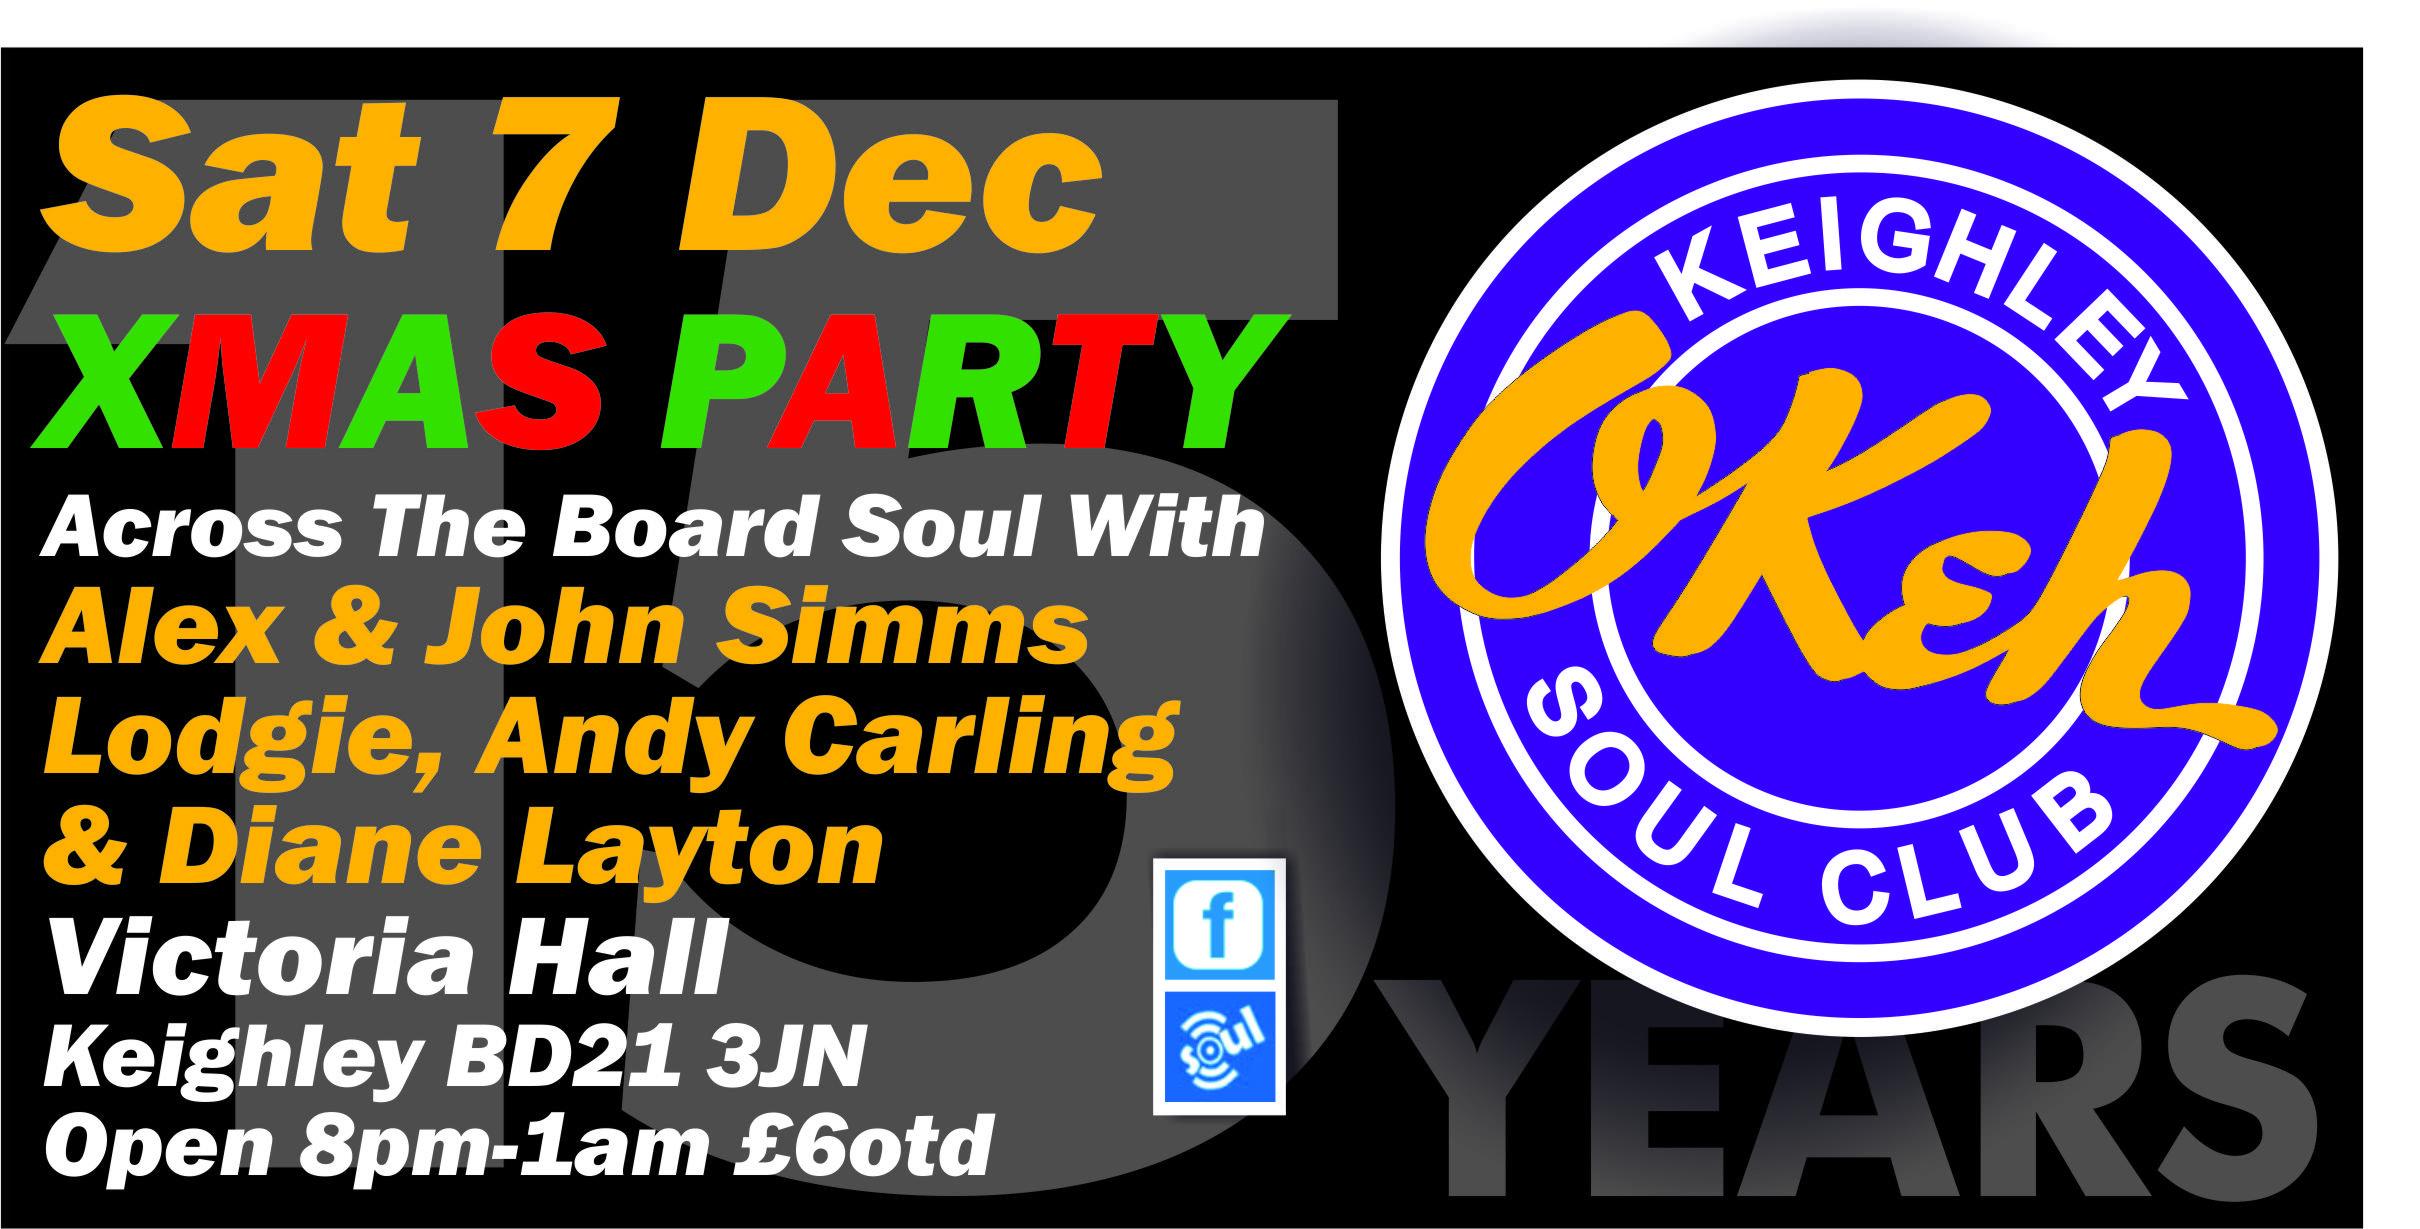 Keighley Okeh Soul Club Xmas Party flyer